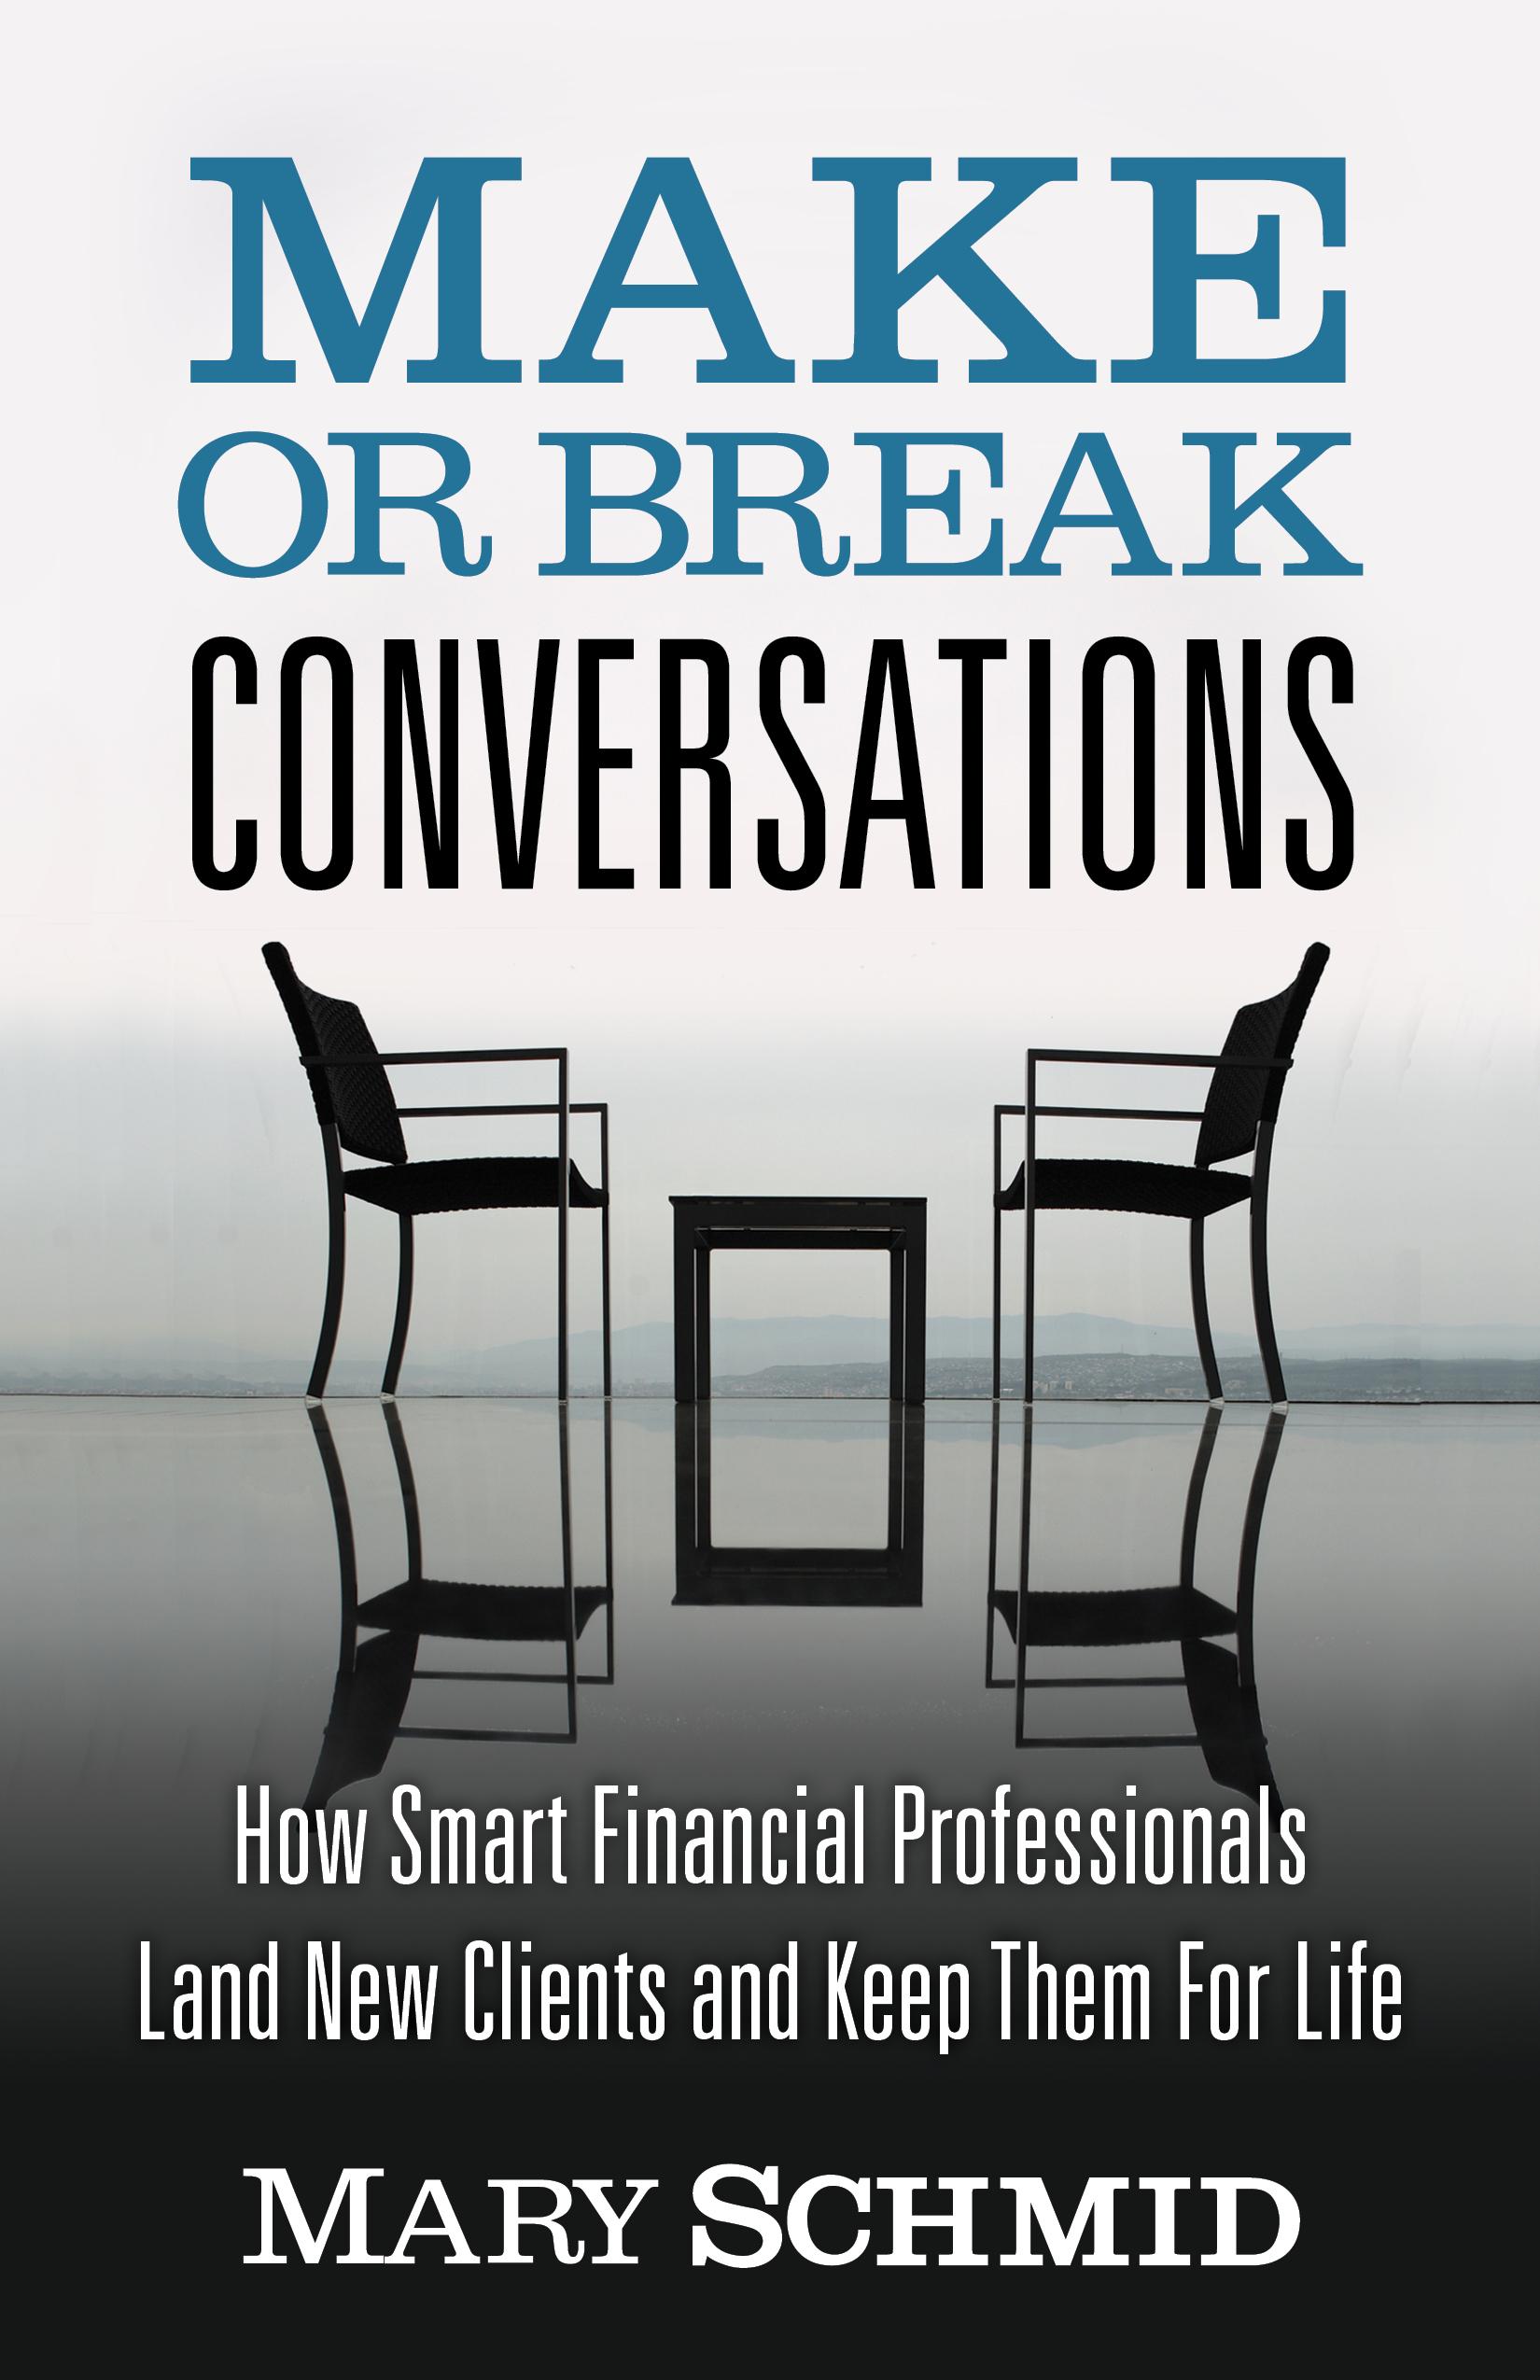 Make or Break Conversations